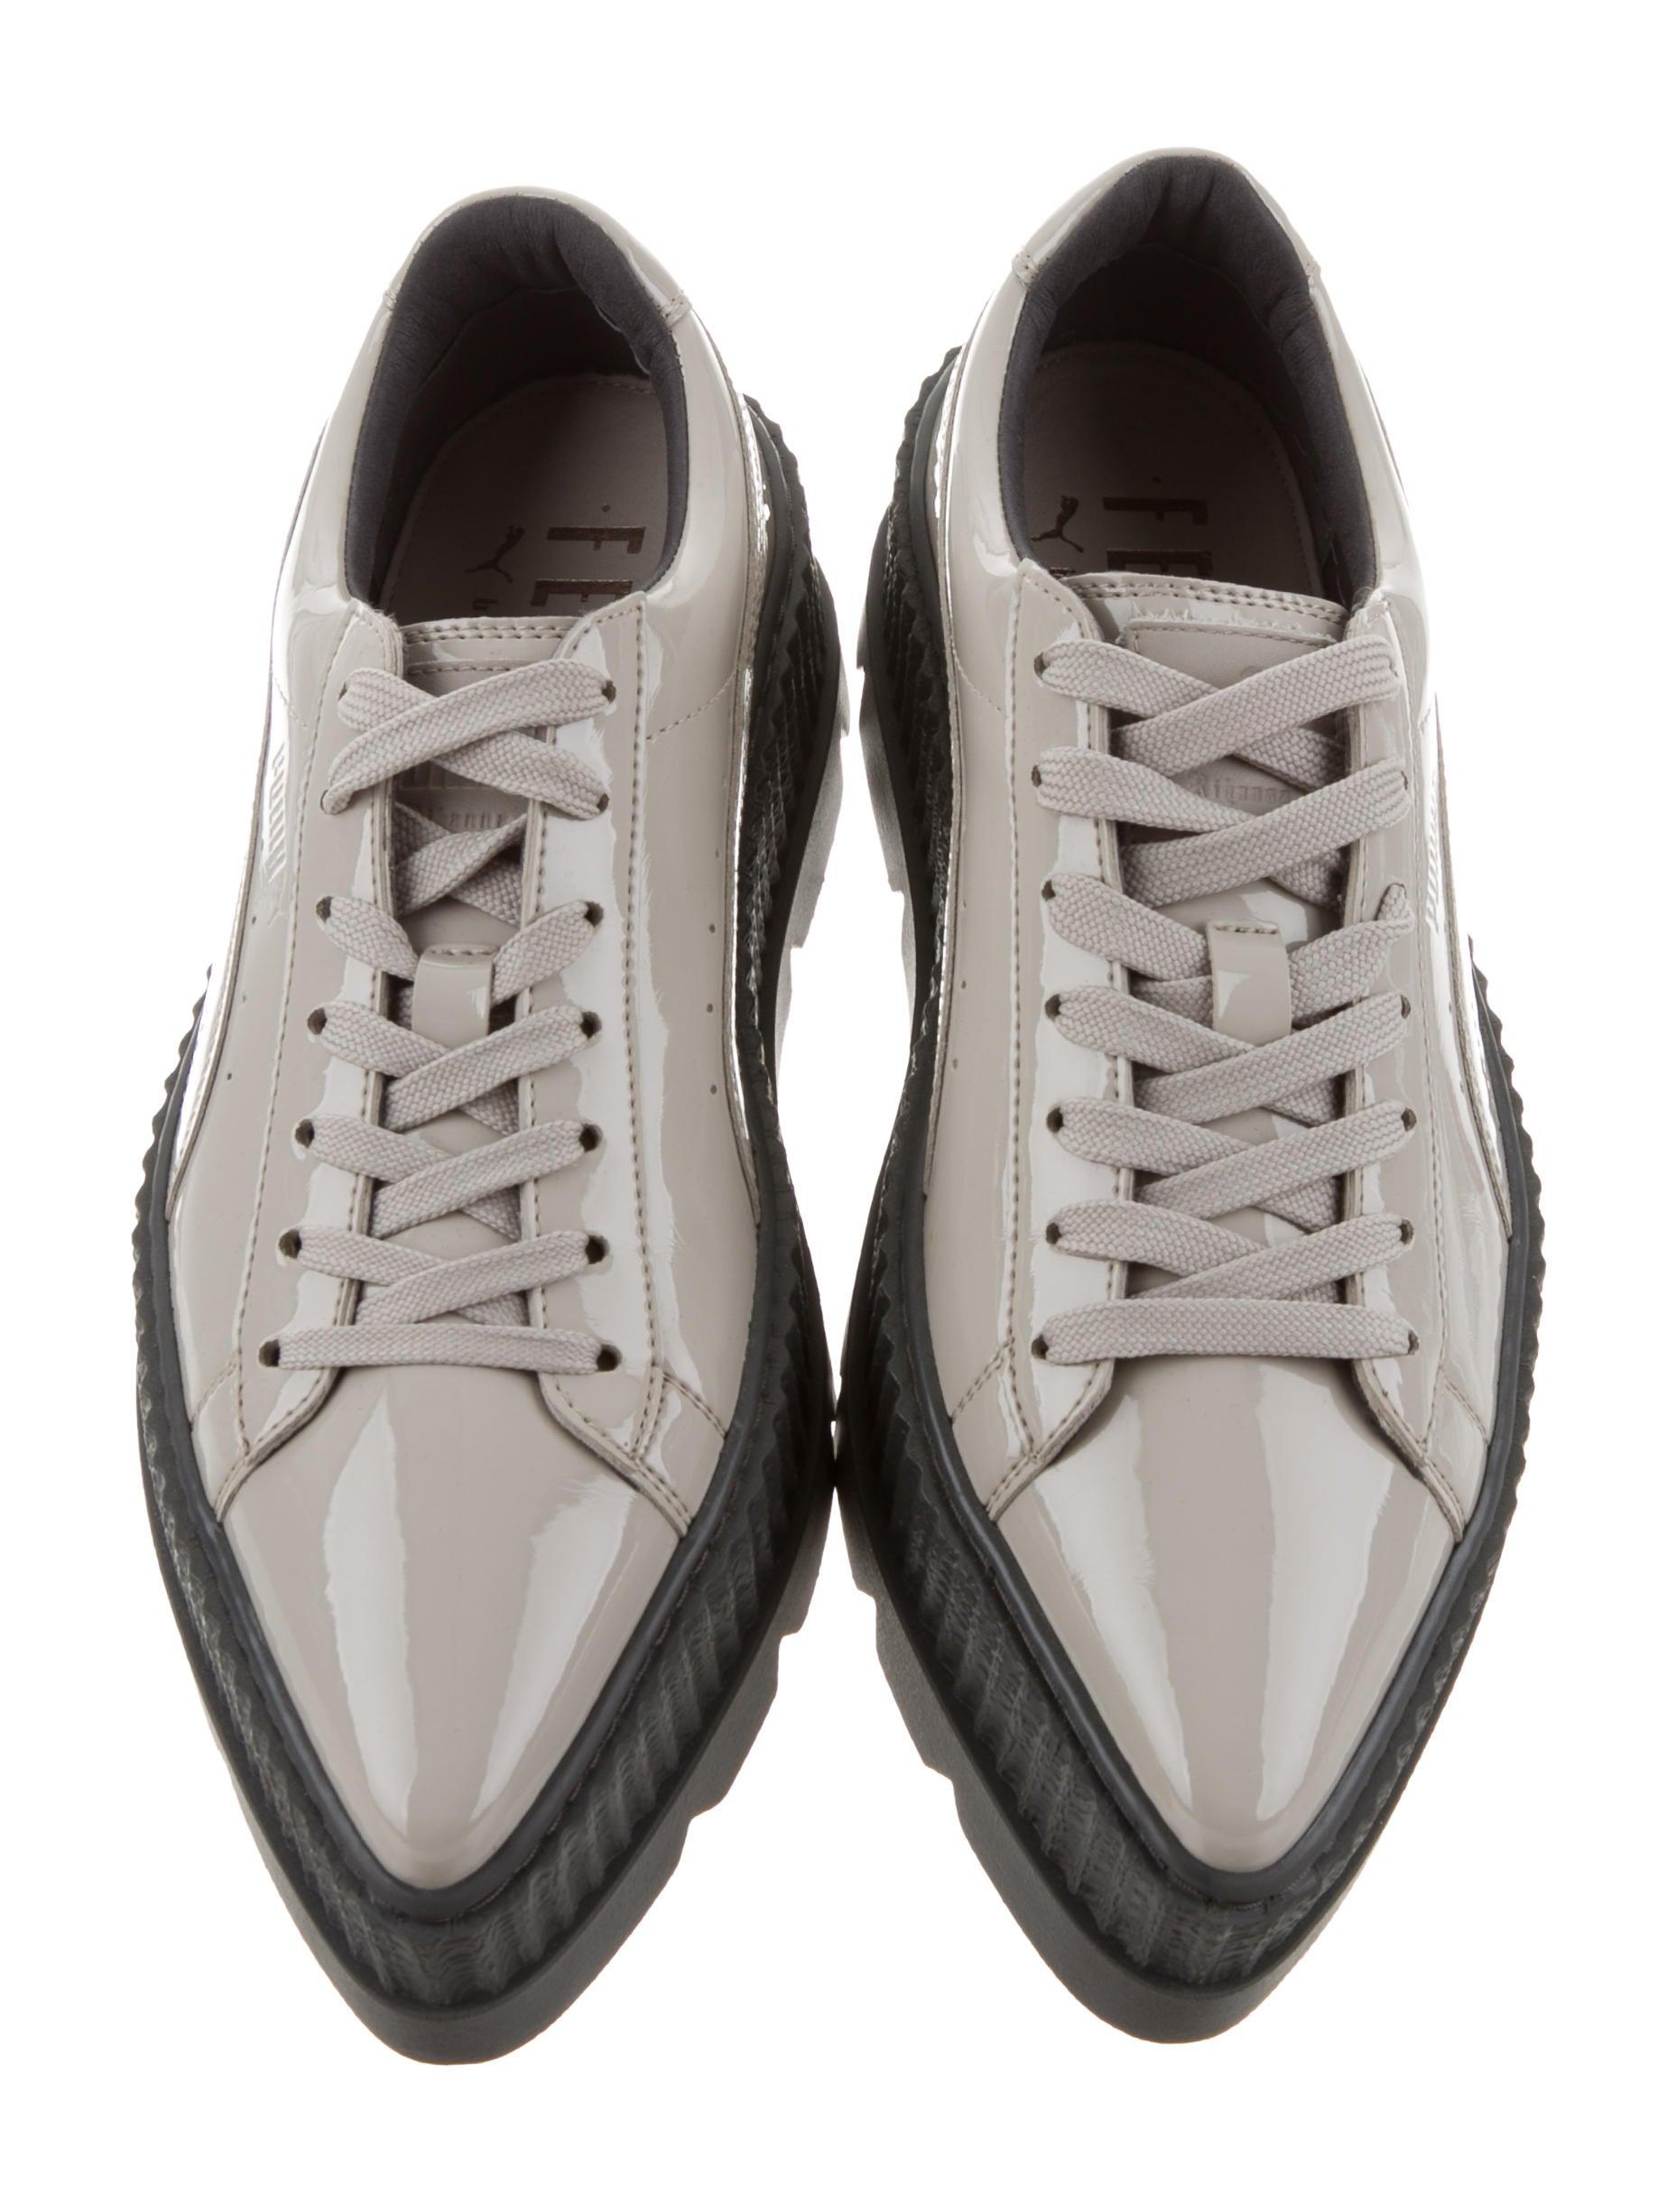 Fenty x Puma 2018 Pointy Creeper Sneakers w/ Tags cheap 2014 new 8WpHxdHcWu